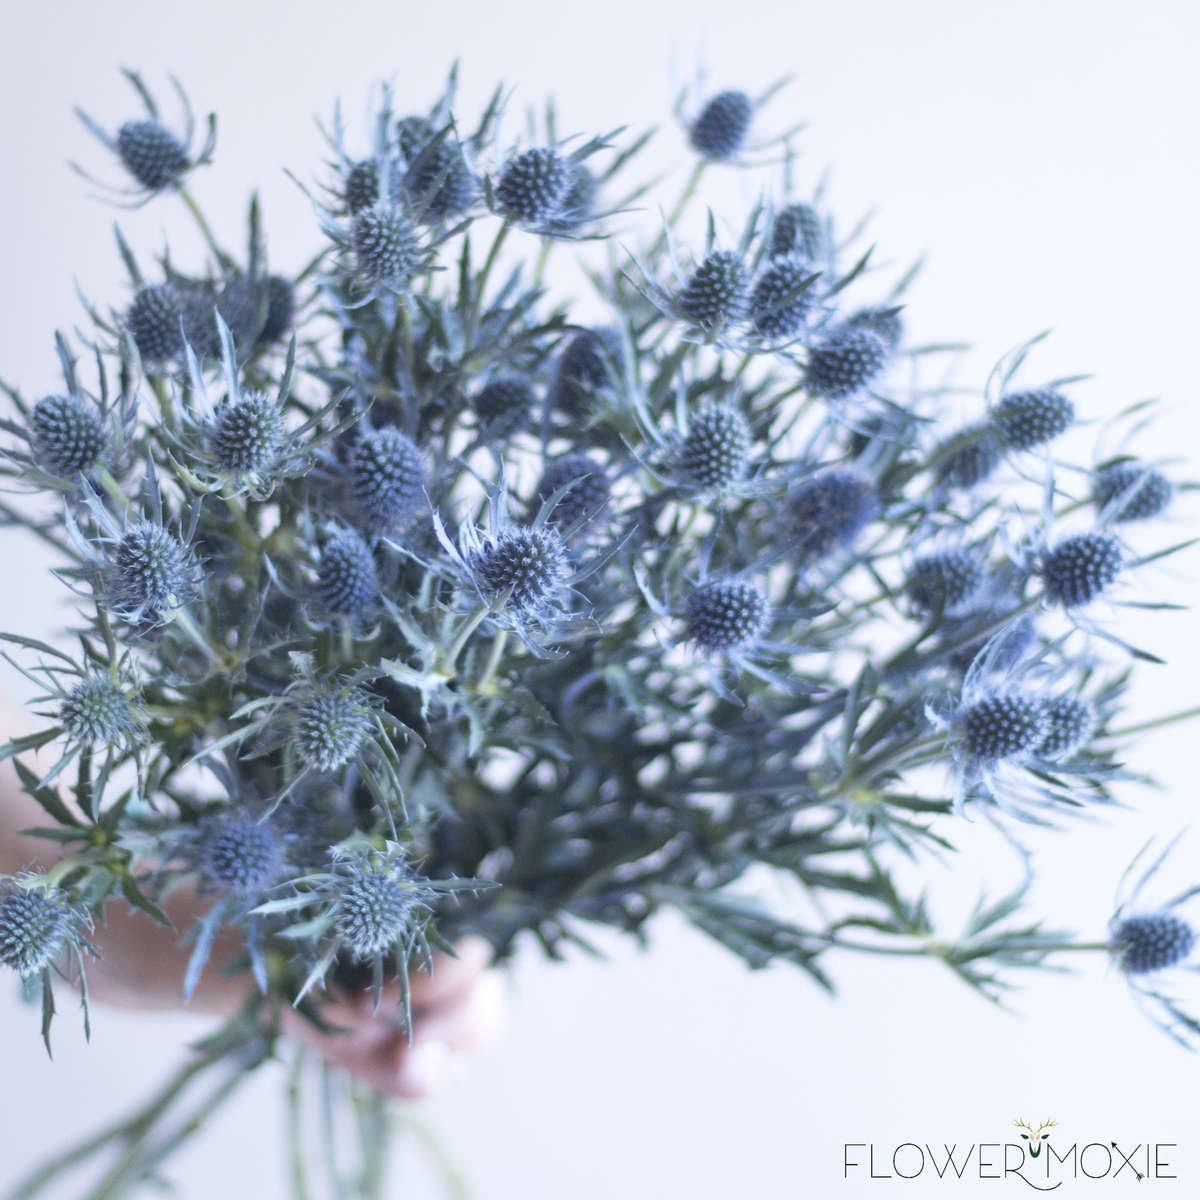 Thistle — Flower Moxie